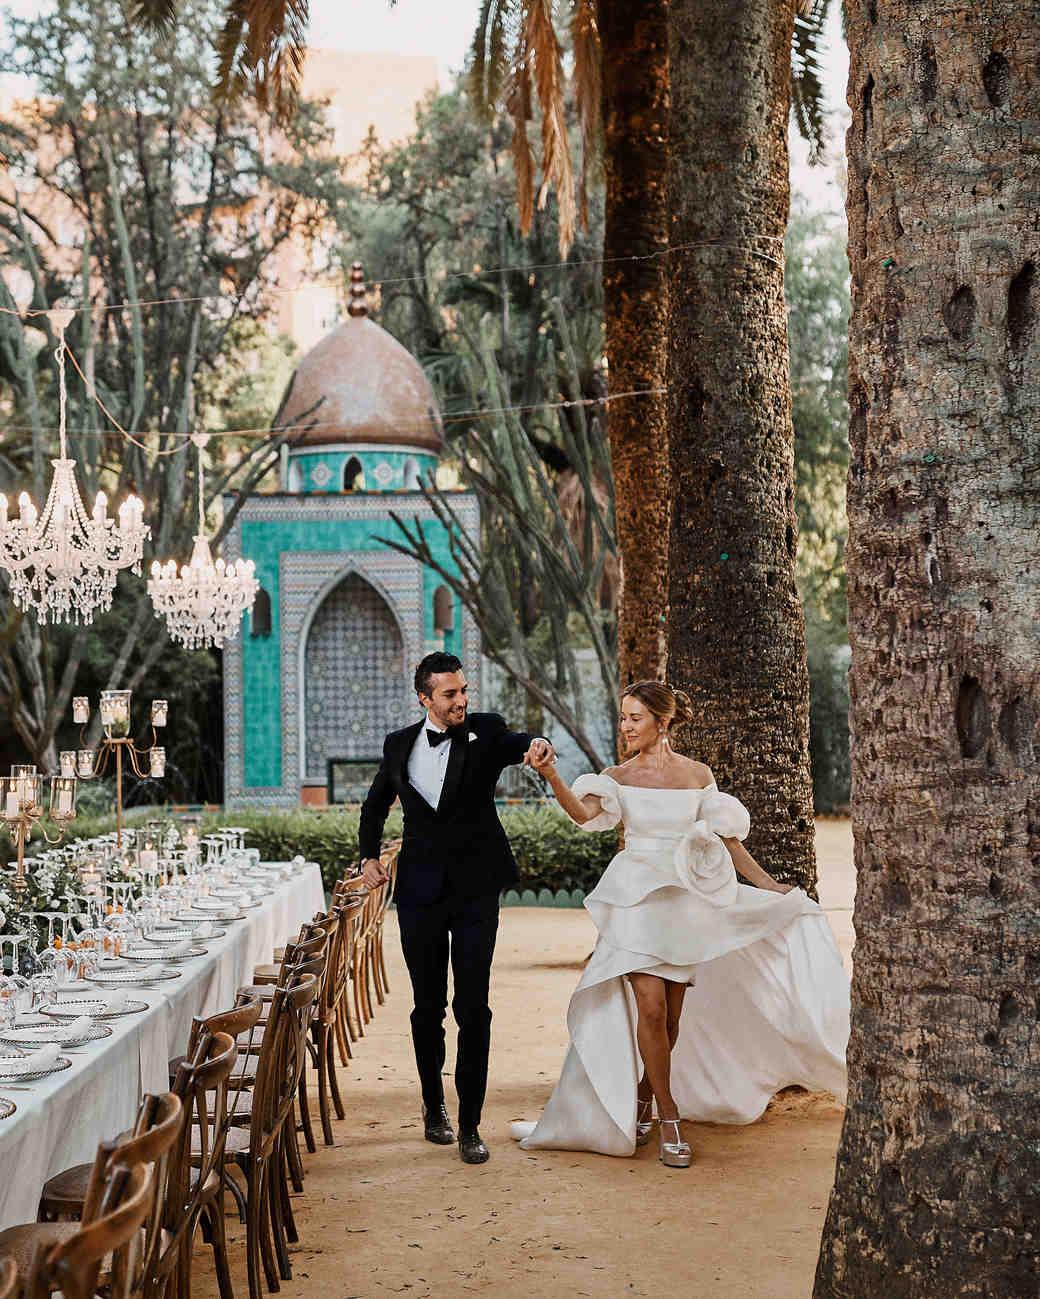 karolina sorab wedding couple outdoor reception